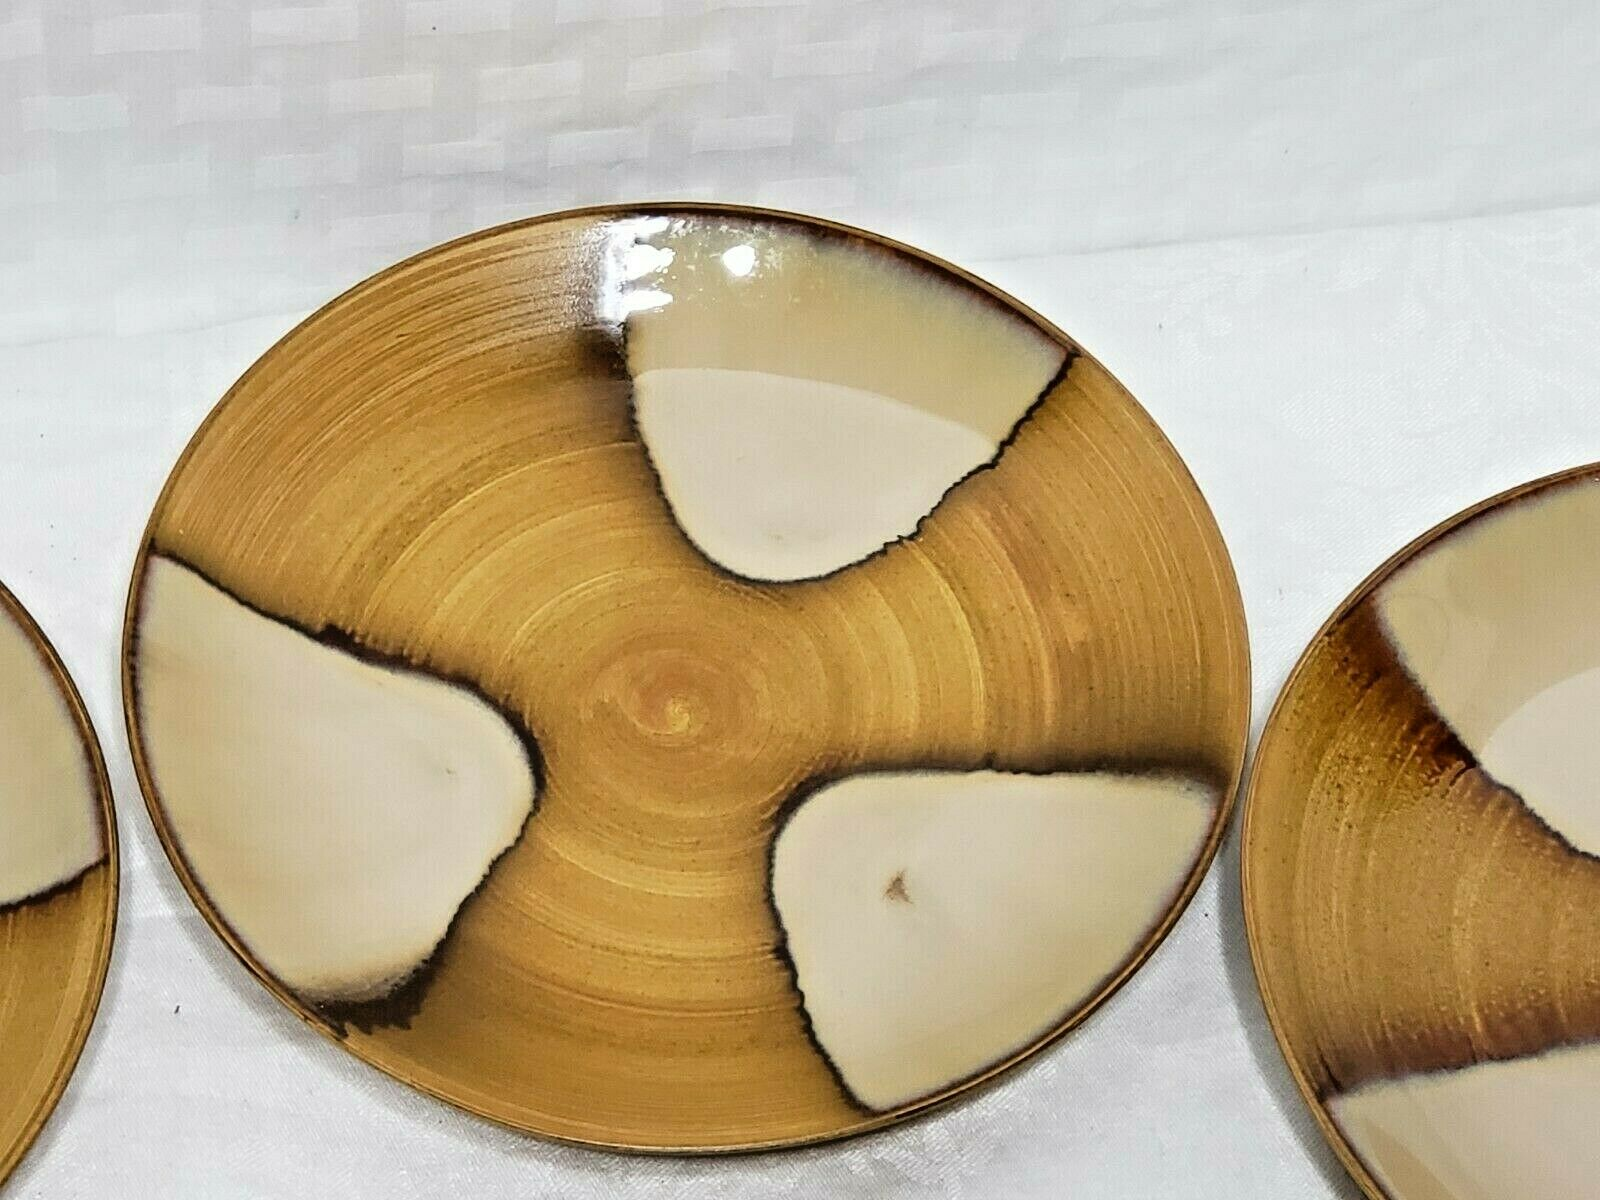 Four Sango Splash 4951 Salad Plates 8.25 D Vintage Stoneware Rustic Drip Glaze - $25.99